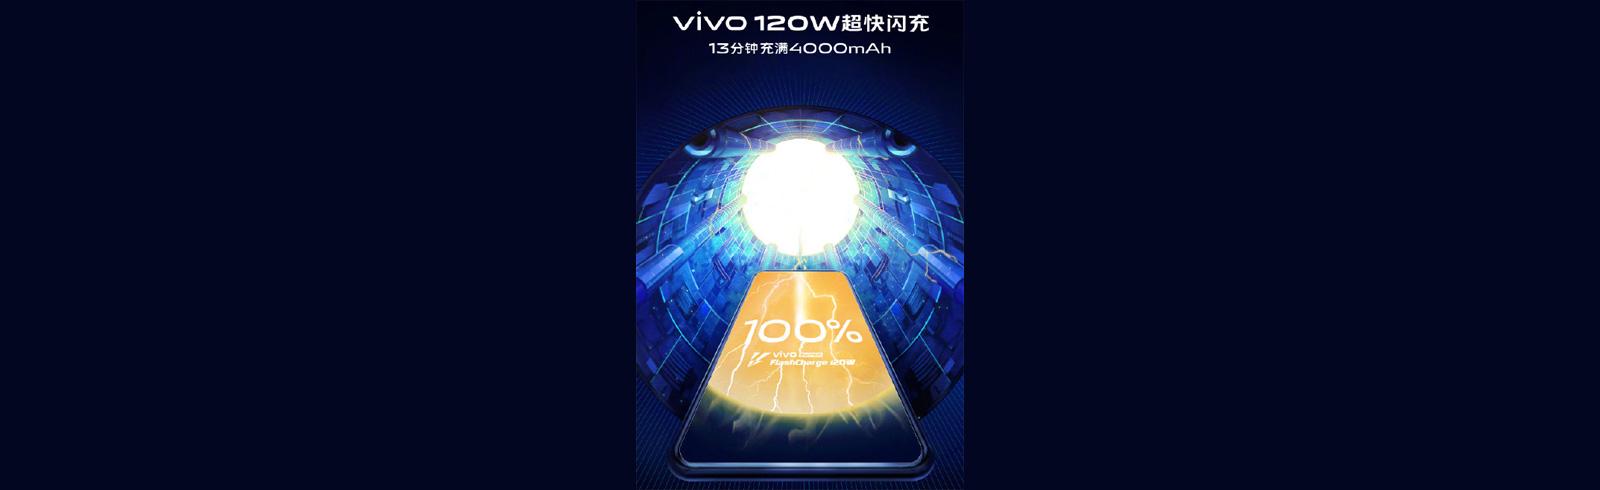 Vivo announces its 120W Super FlashCharge technology